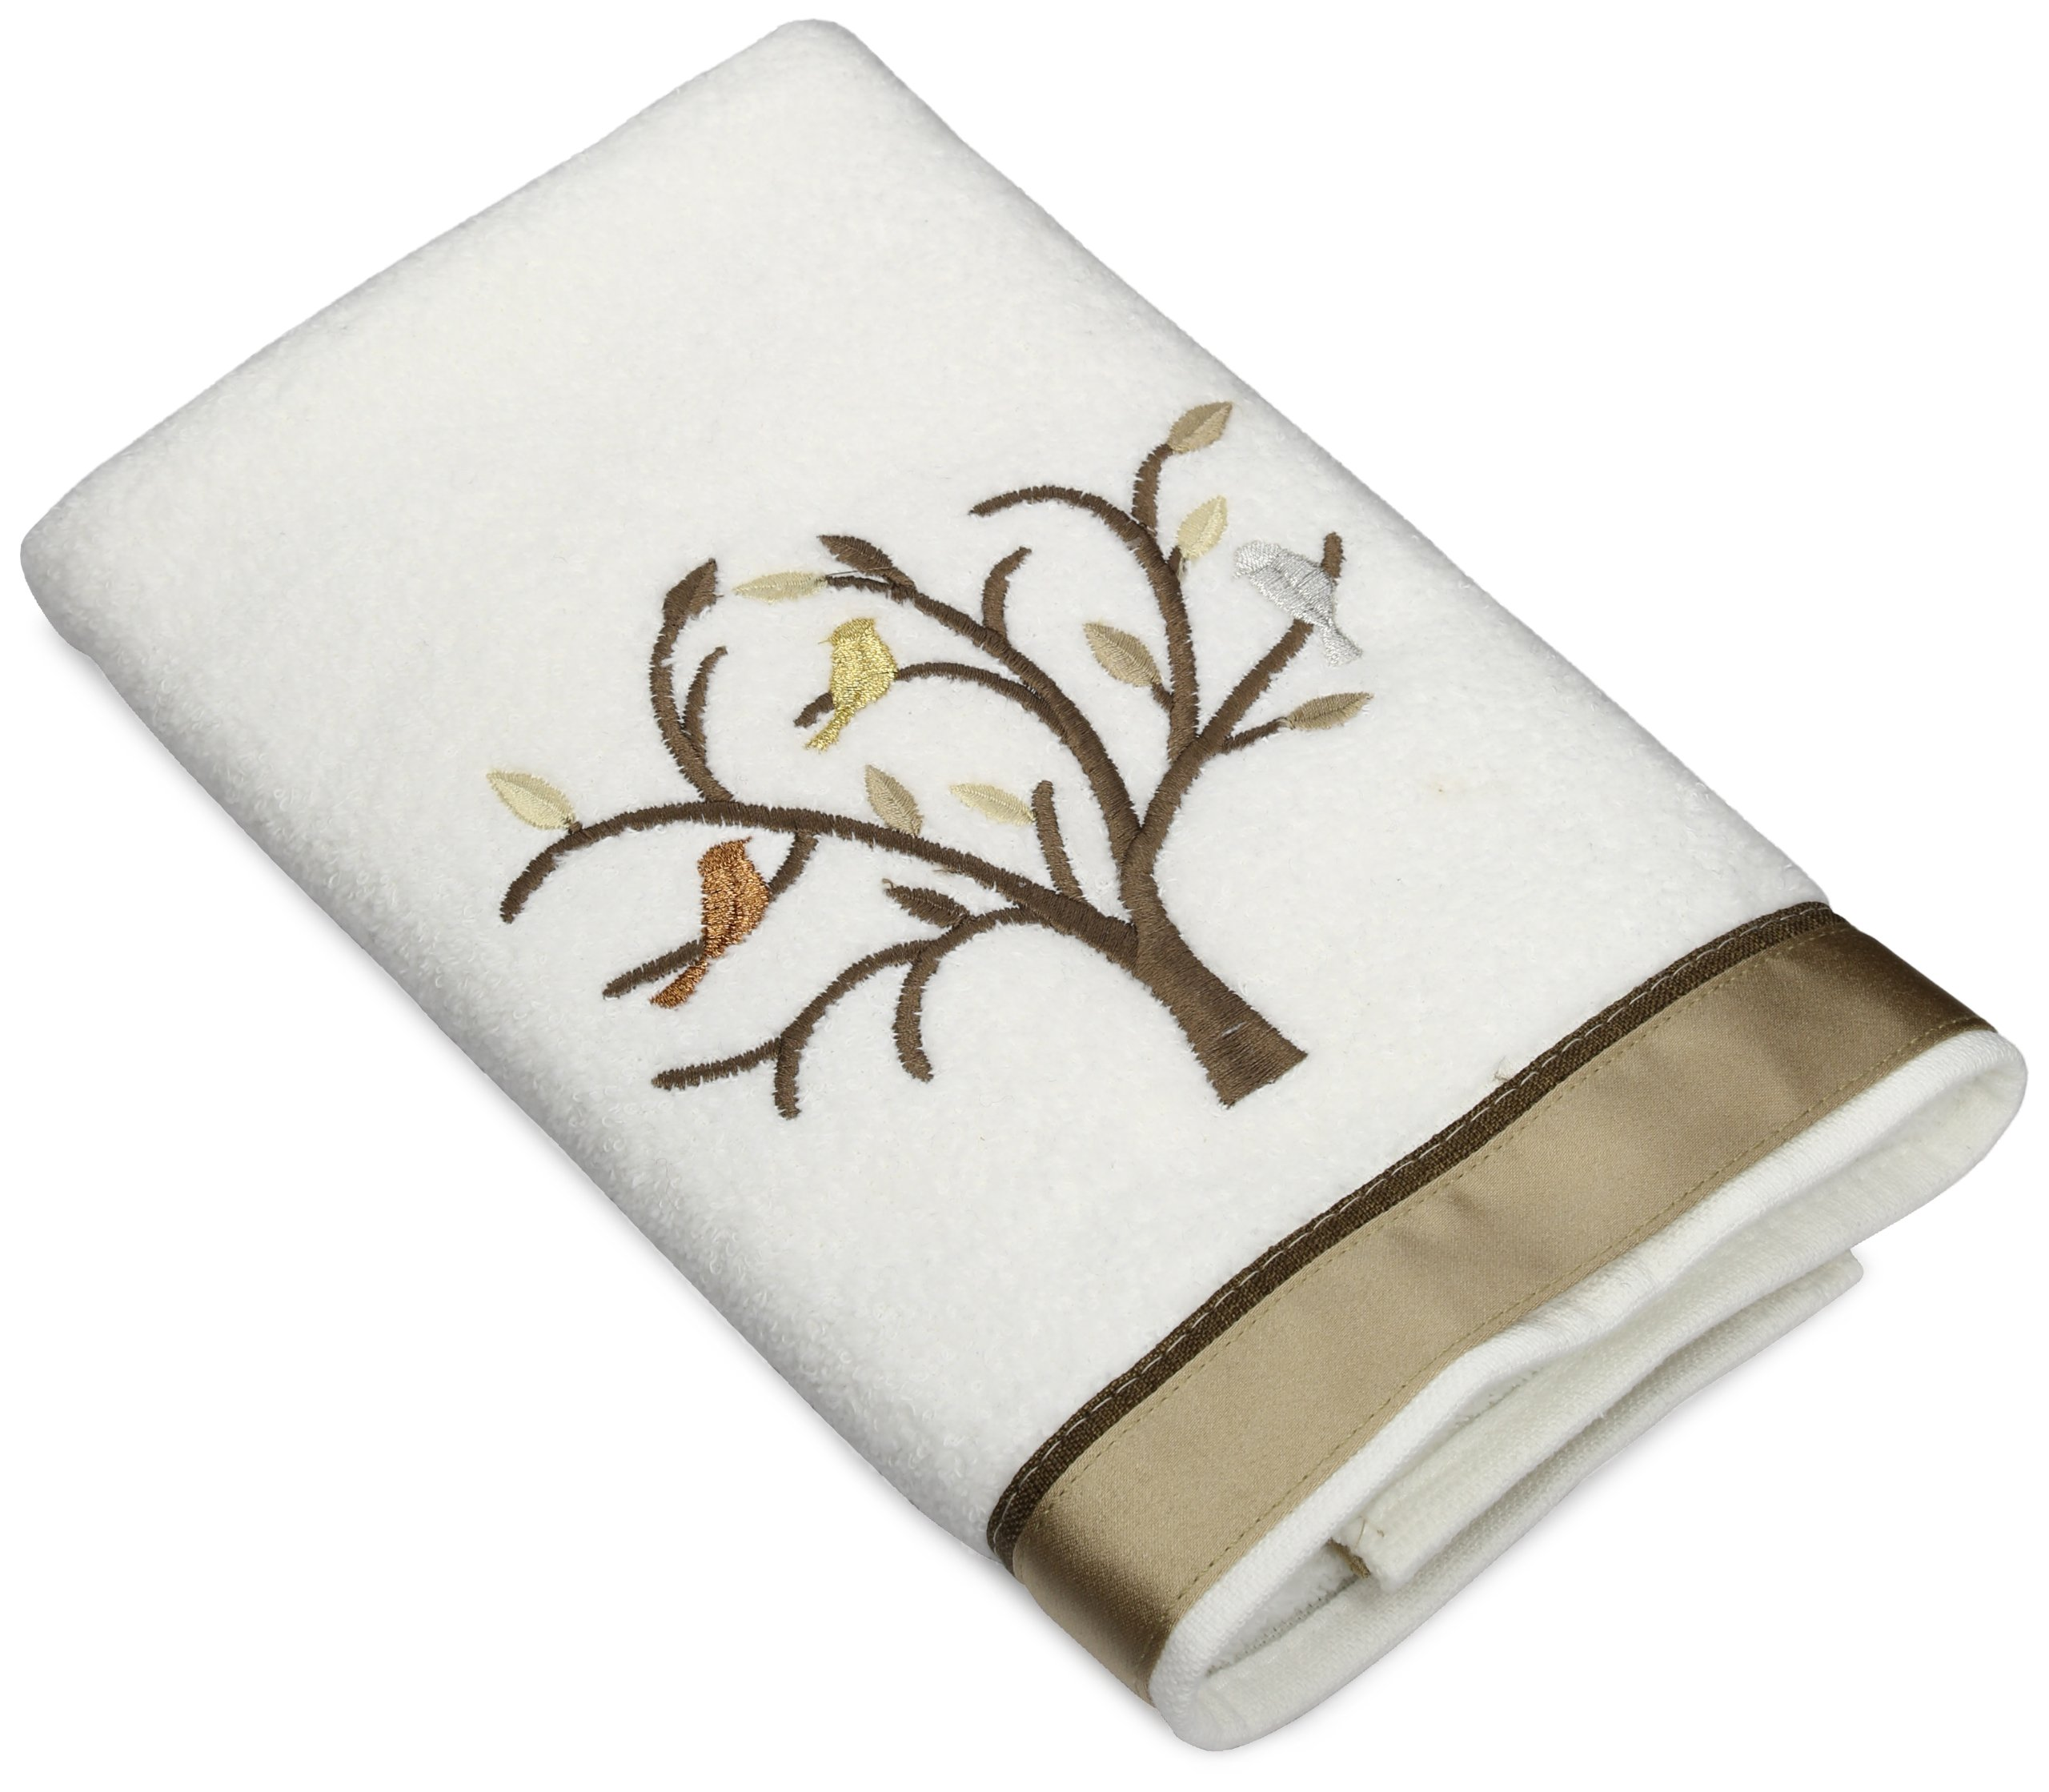 Avanti Linens Friendly Gathering Hand Towel, White